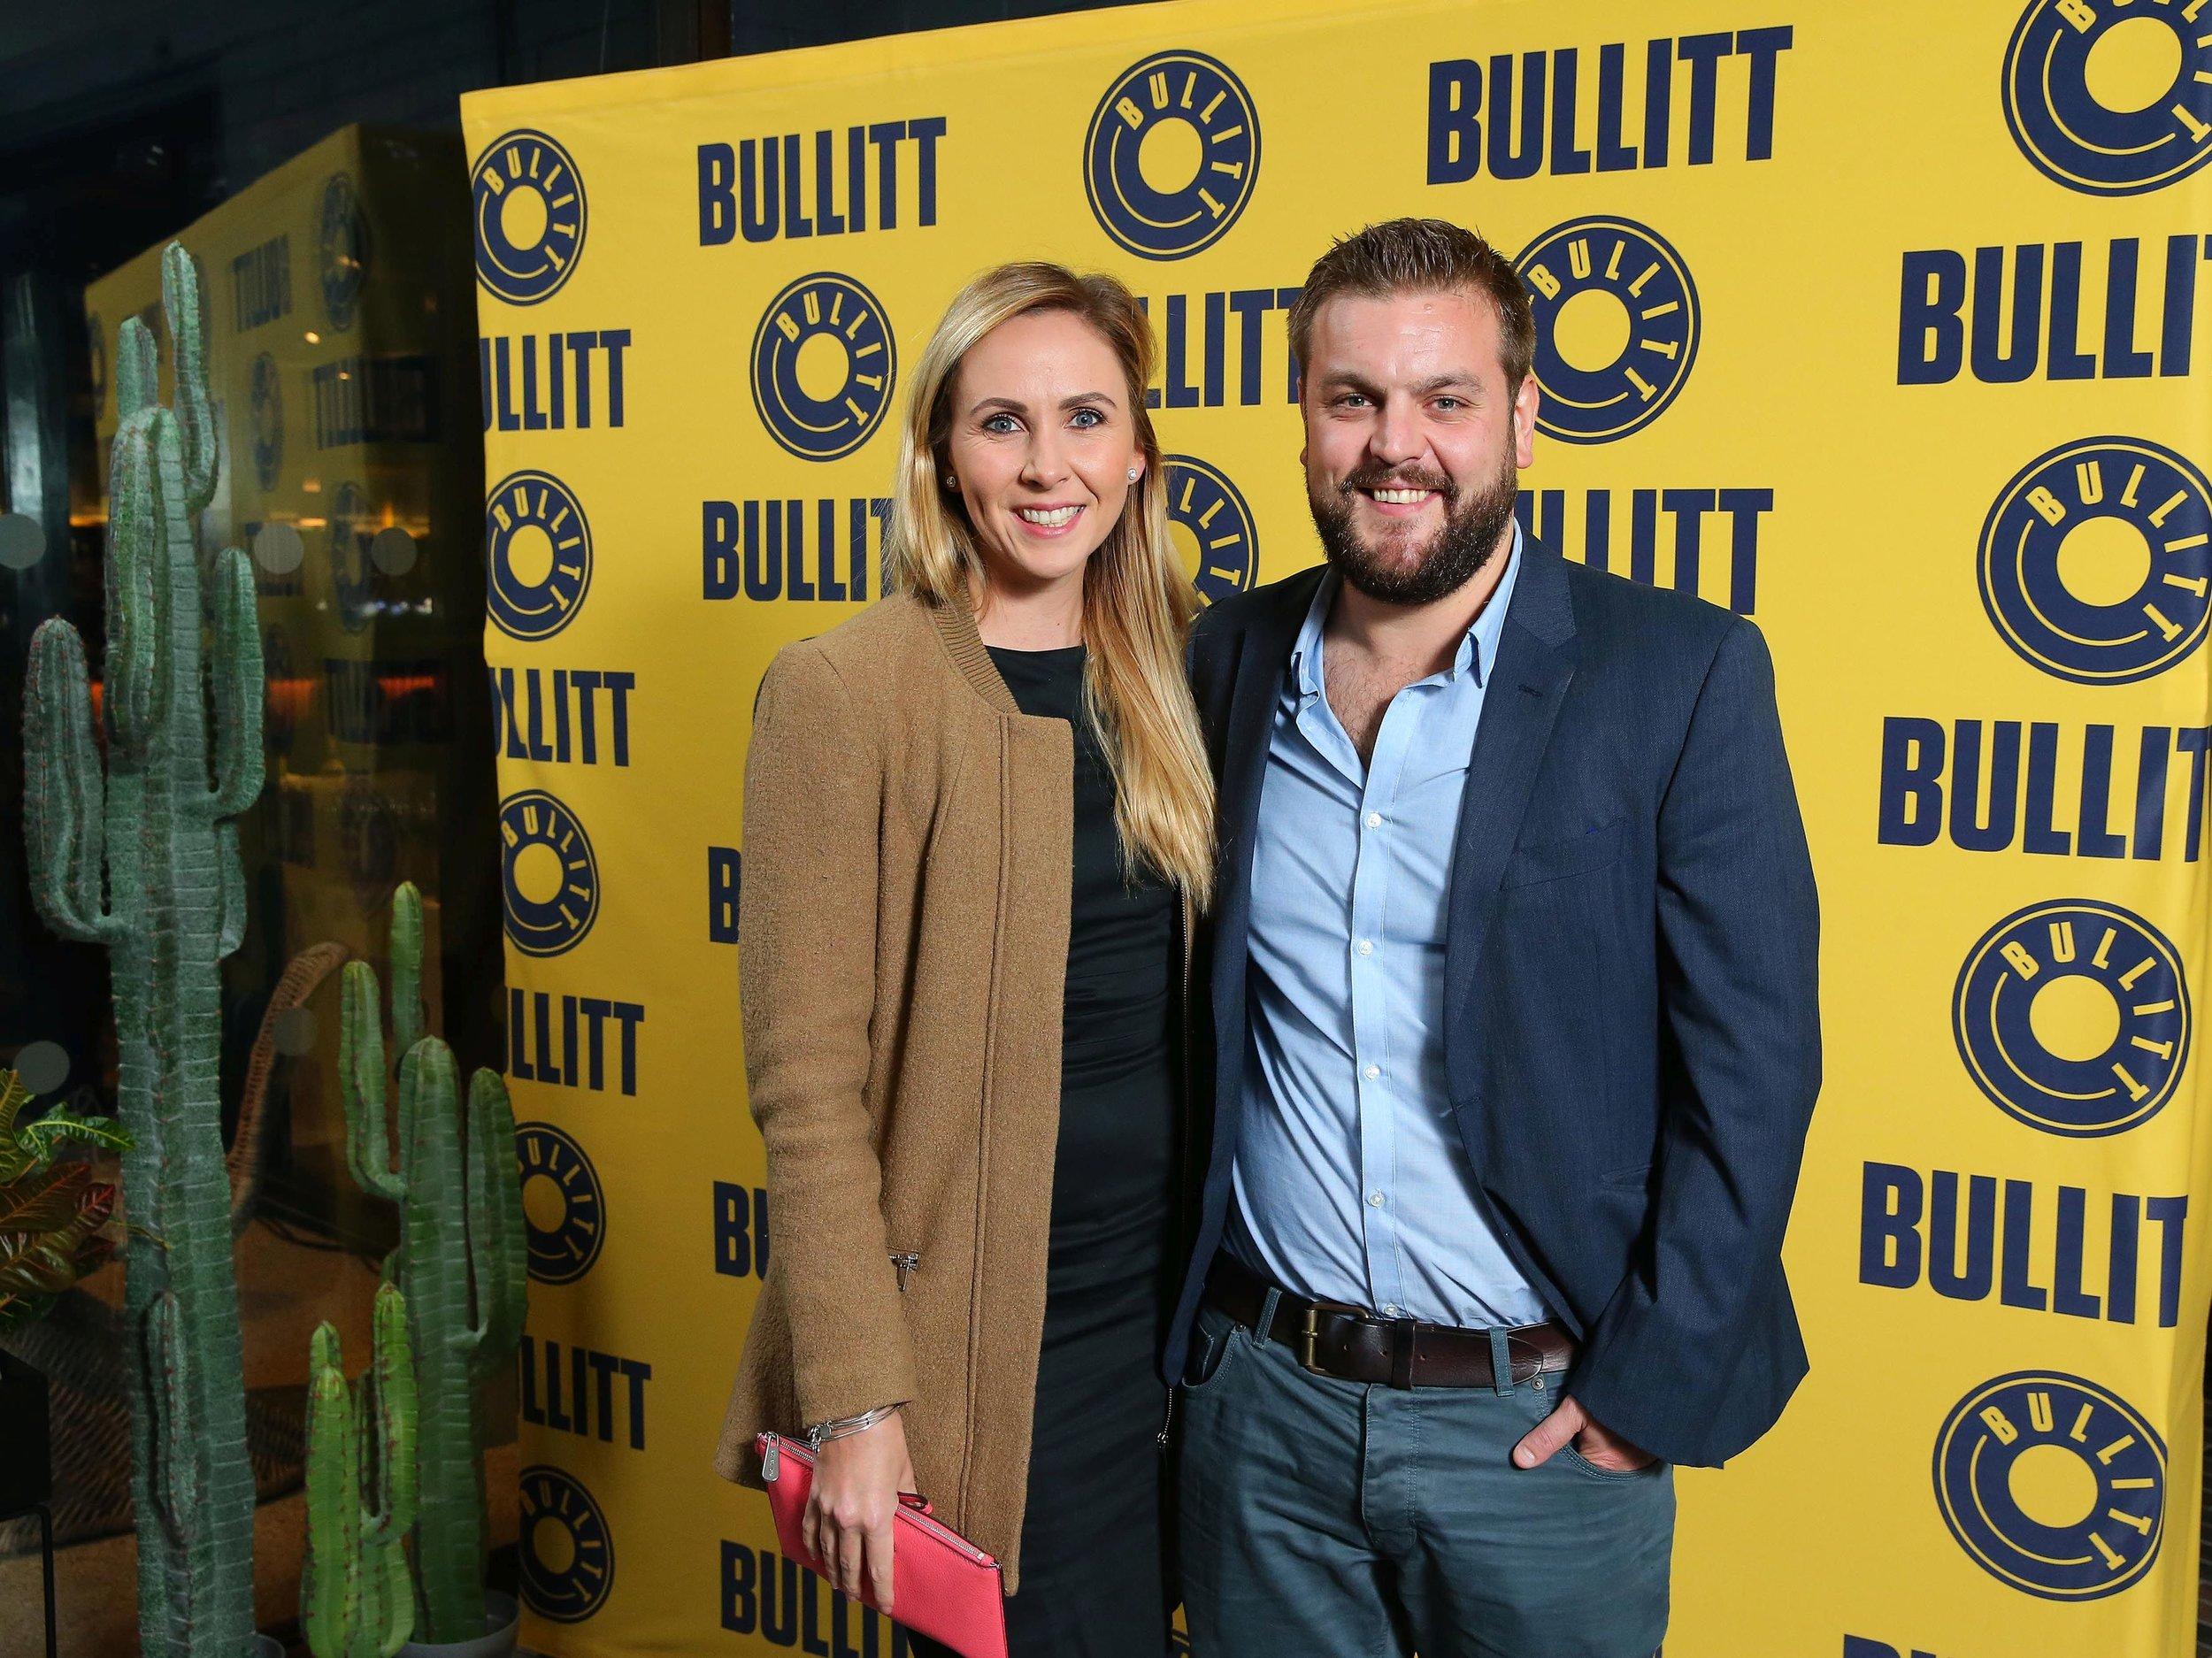 Bullitt Launch Socials 18.JPG